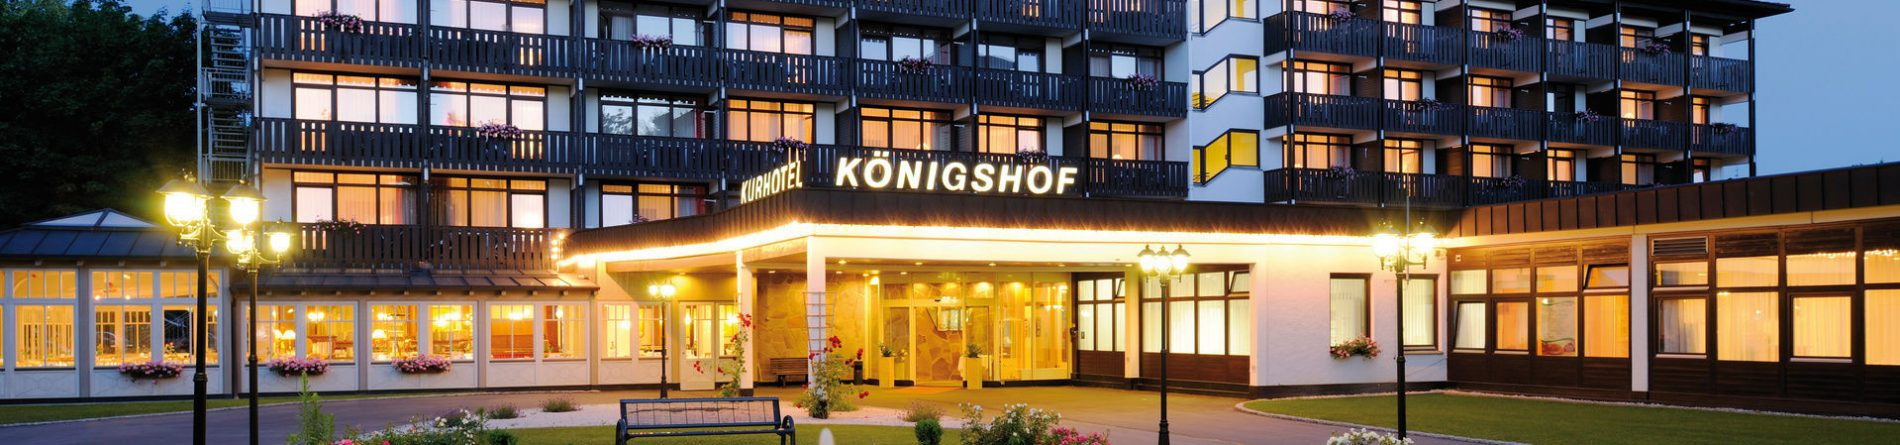 Johannesbad Hotel Königshof in <br/>Bad Füssing 5 Nächte ab 249.-